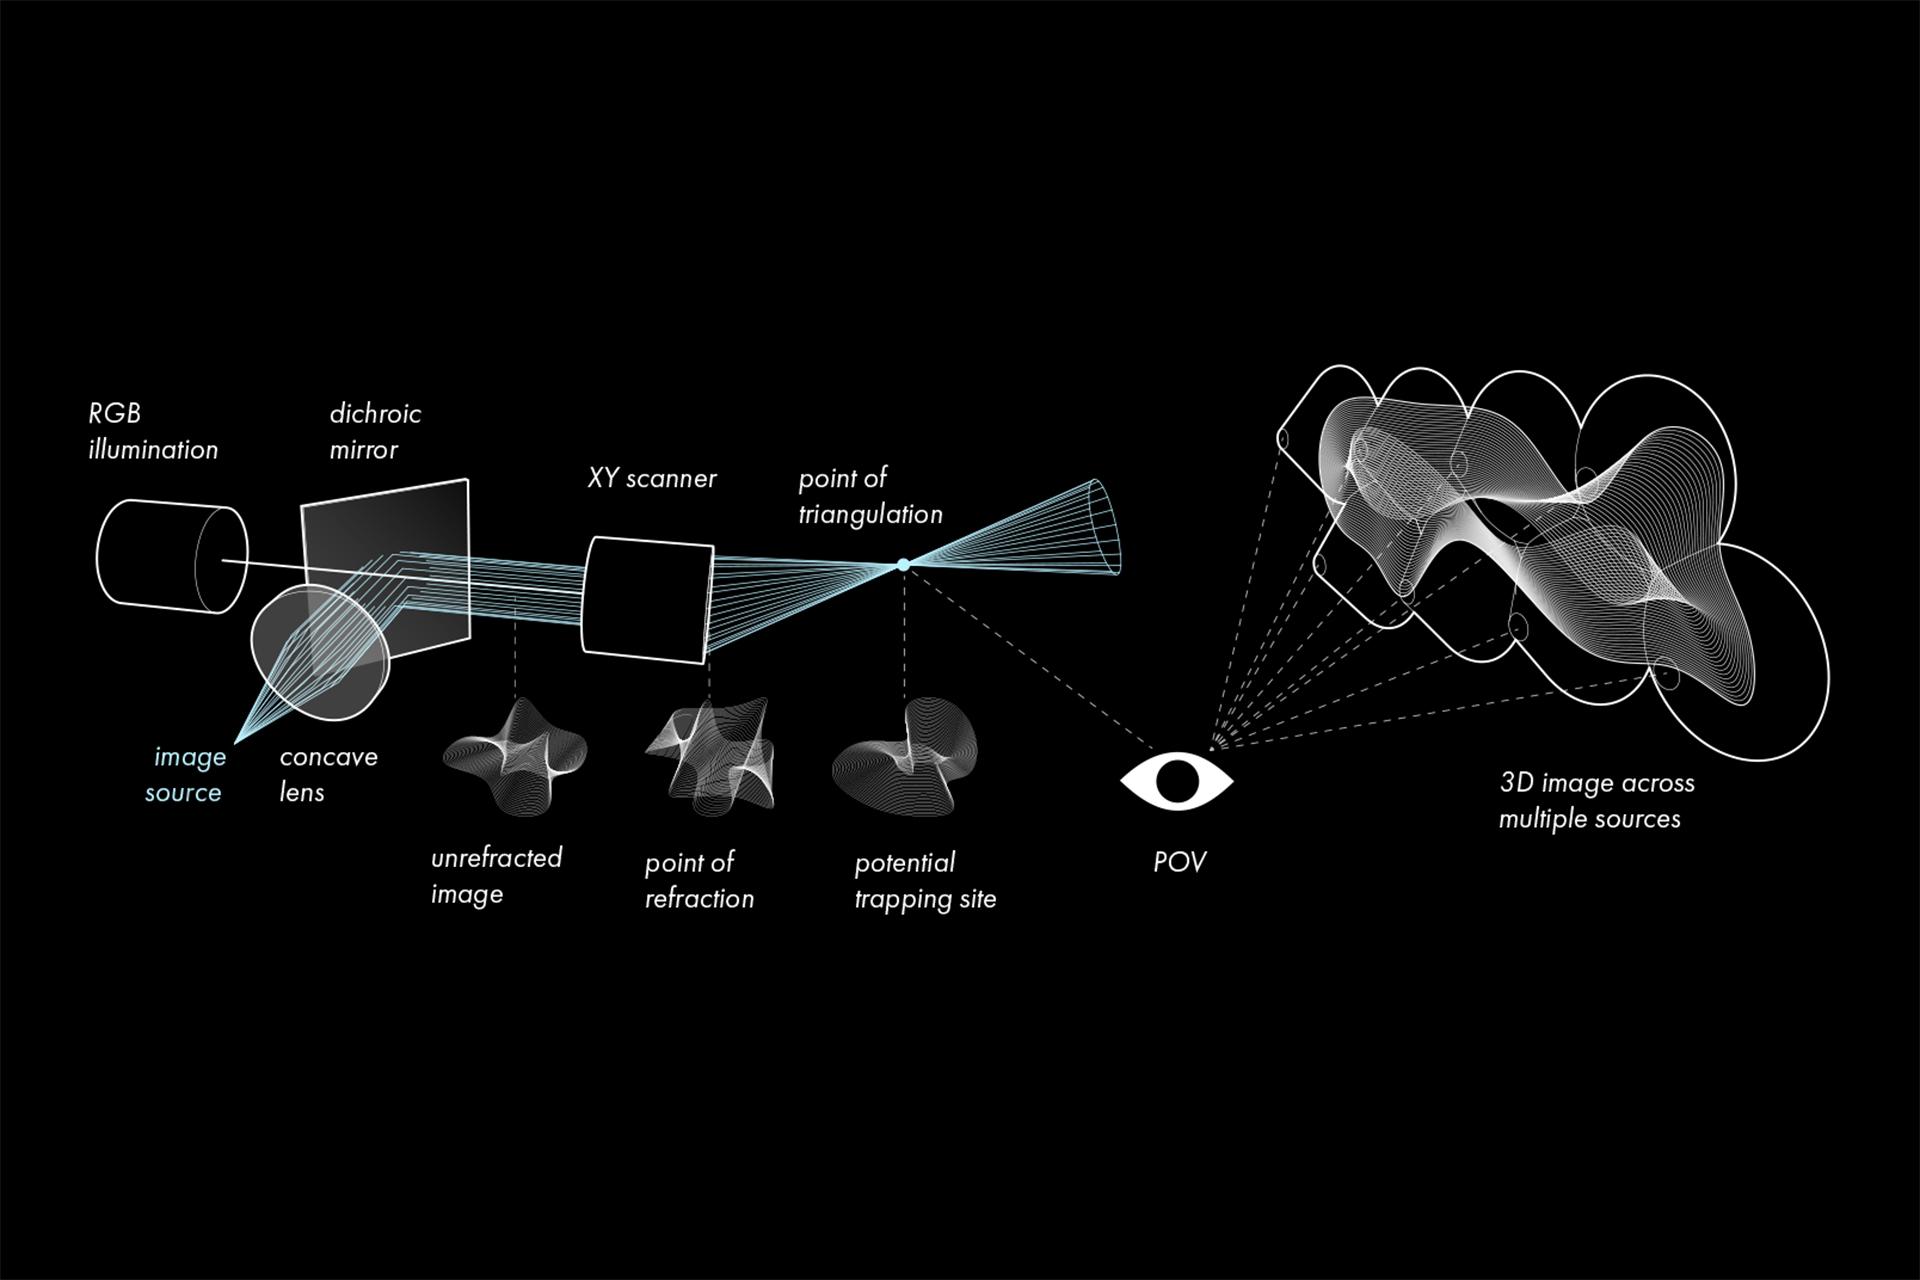 Behruz Hairullaev - Behruz-Hairullaev-HolographicReality-3 (1).jpg